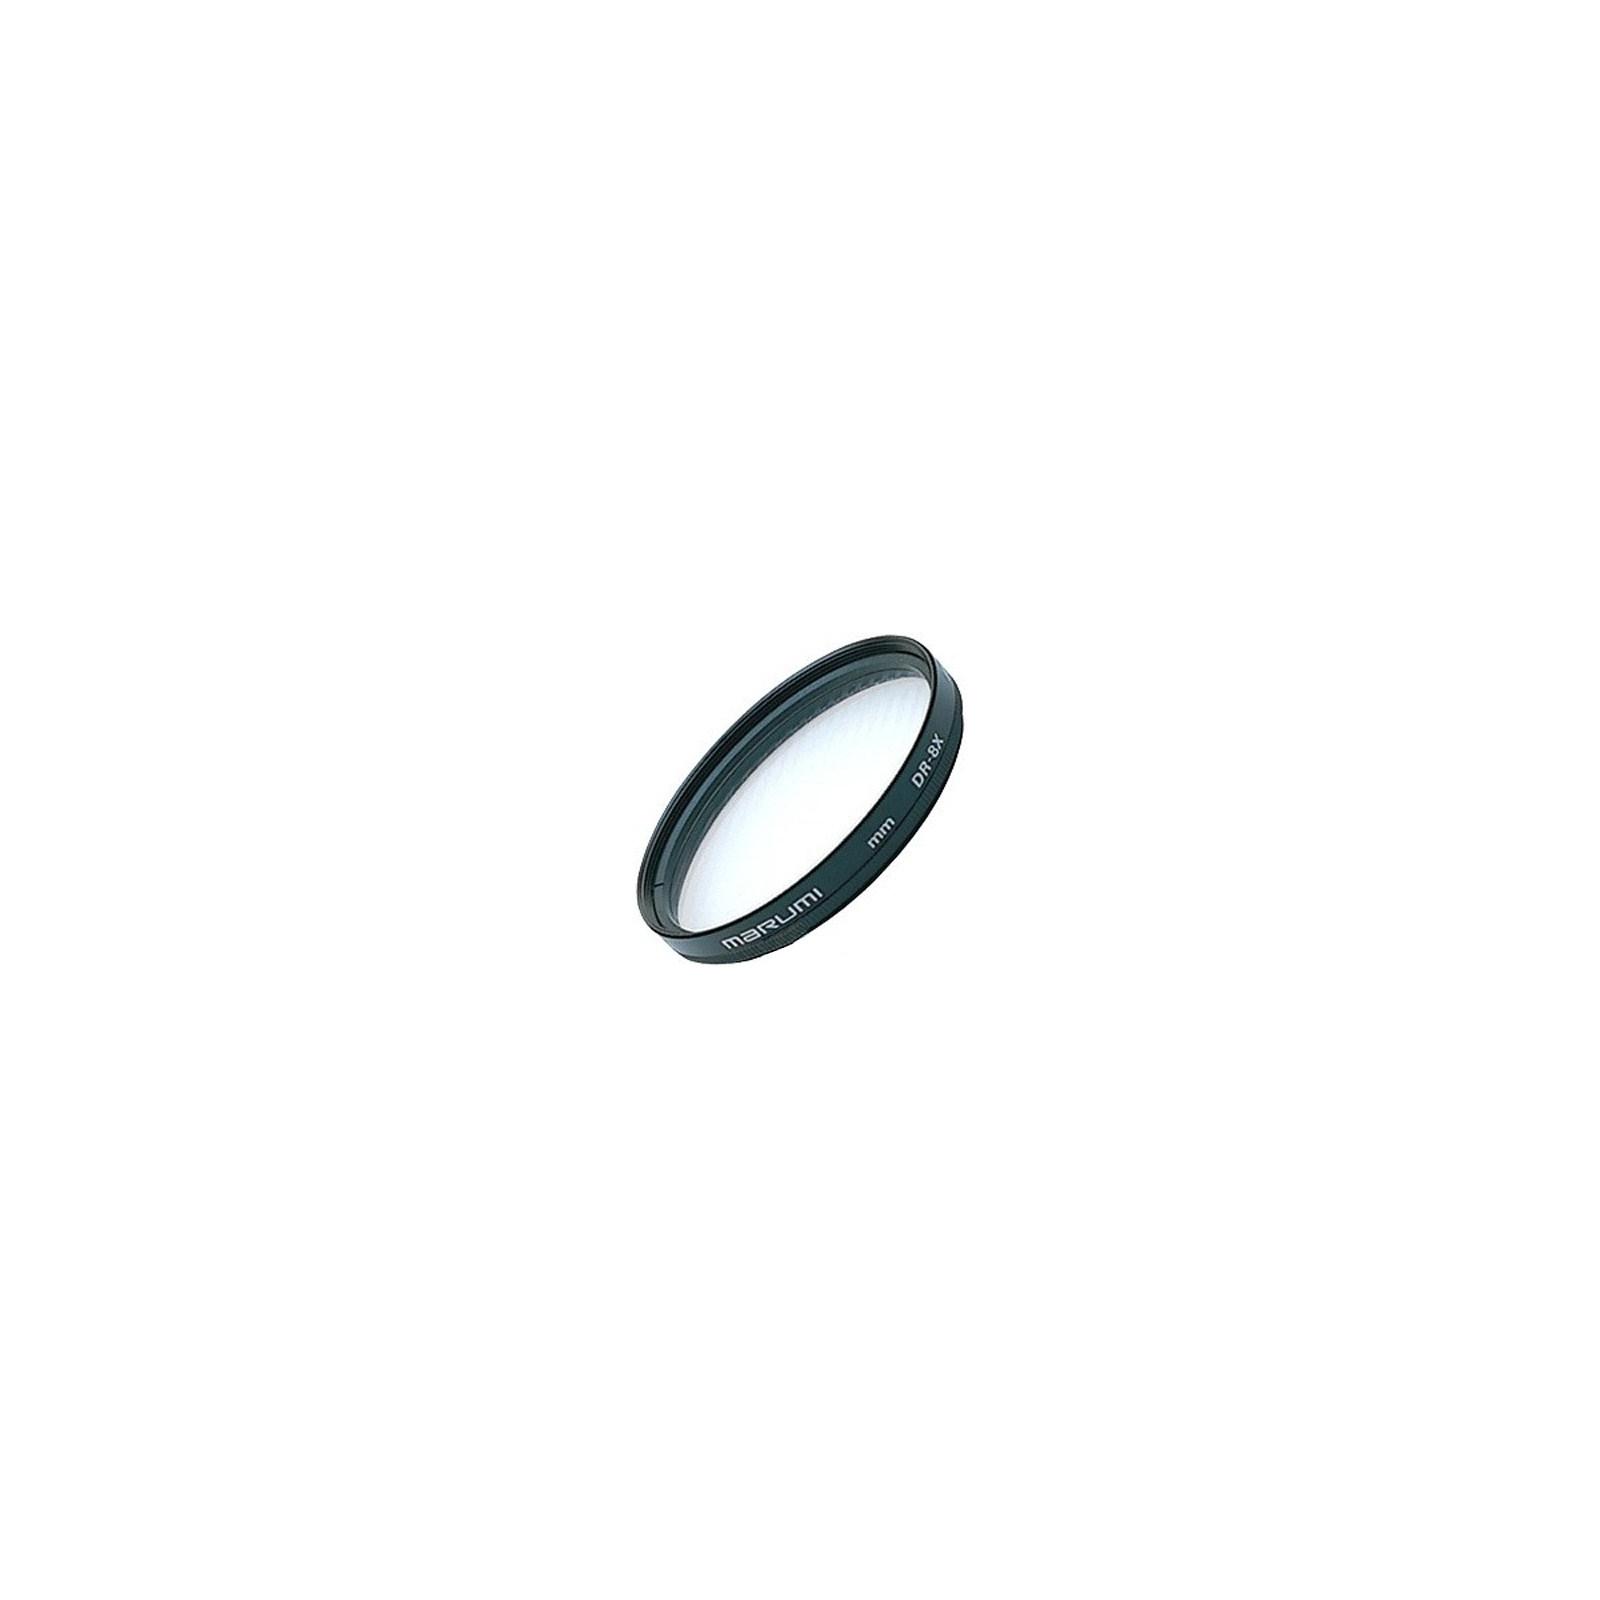 Светофильтр Marumi DR-8X 49mm